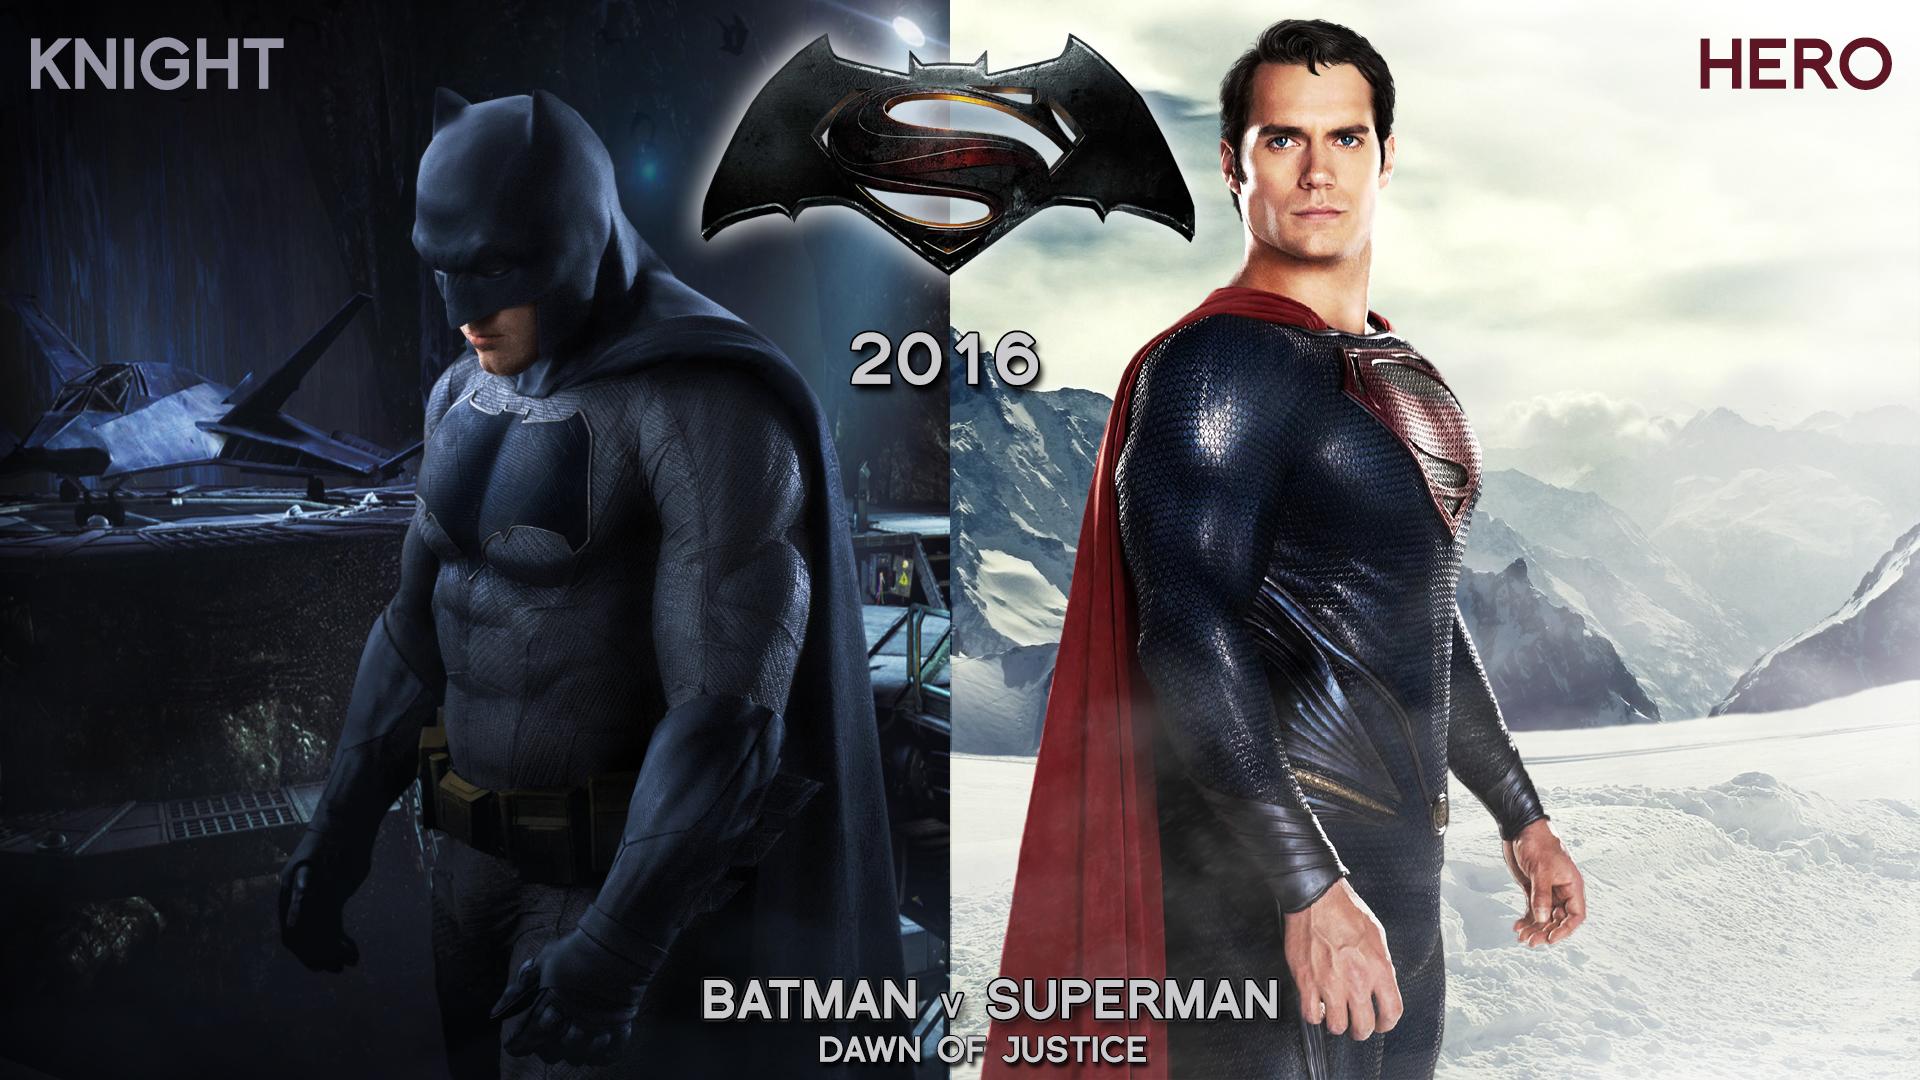 Download Batman V Superman 2016 Knight And Hero Wallpaper Search more 1920x1080